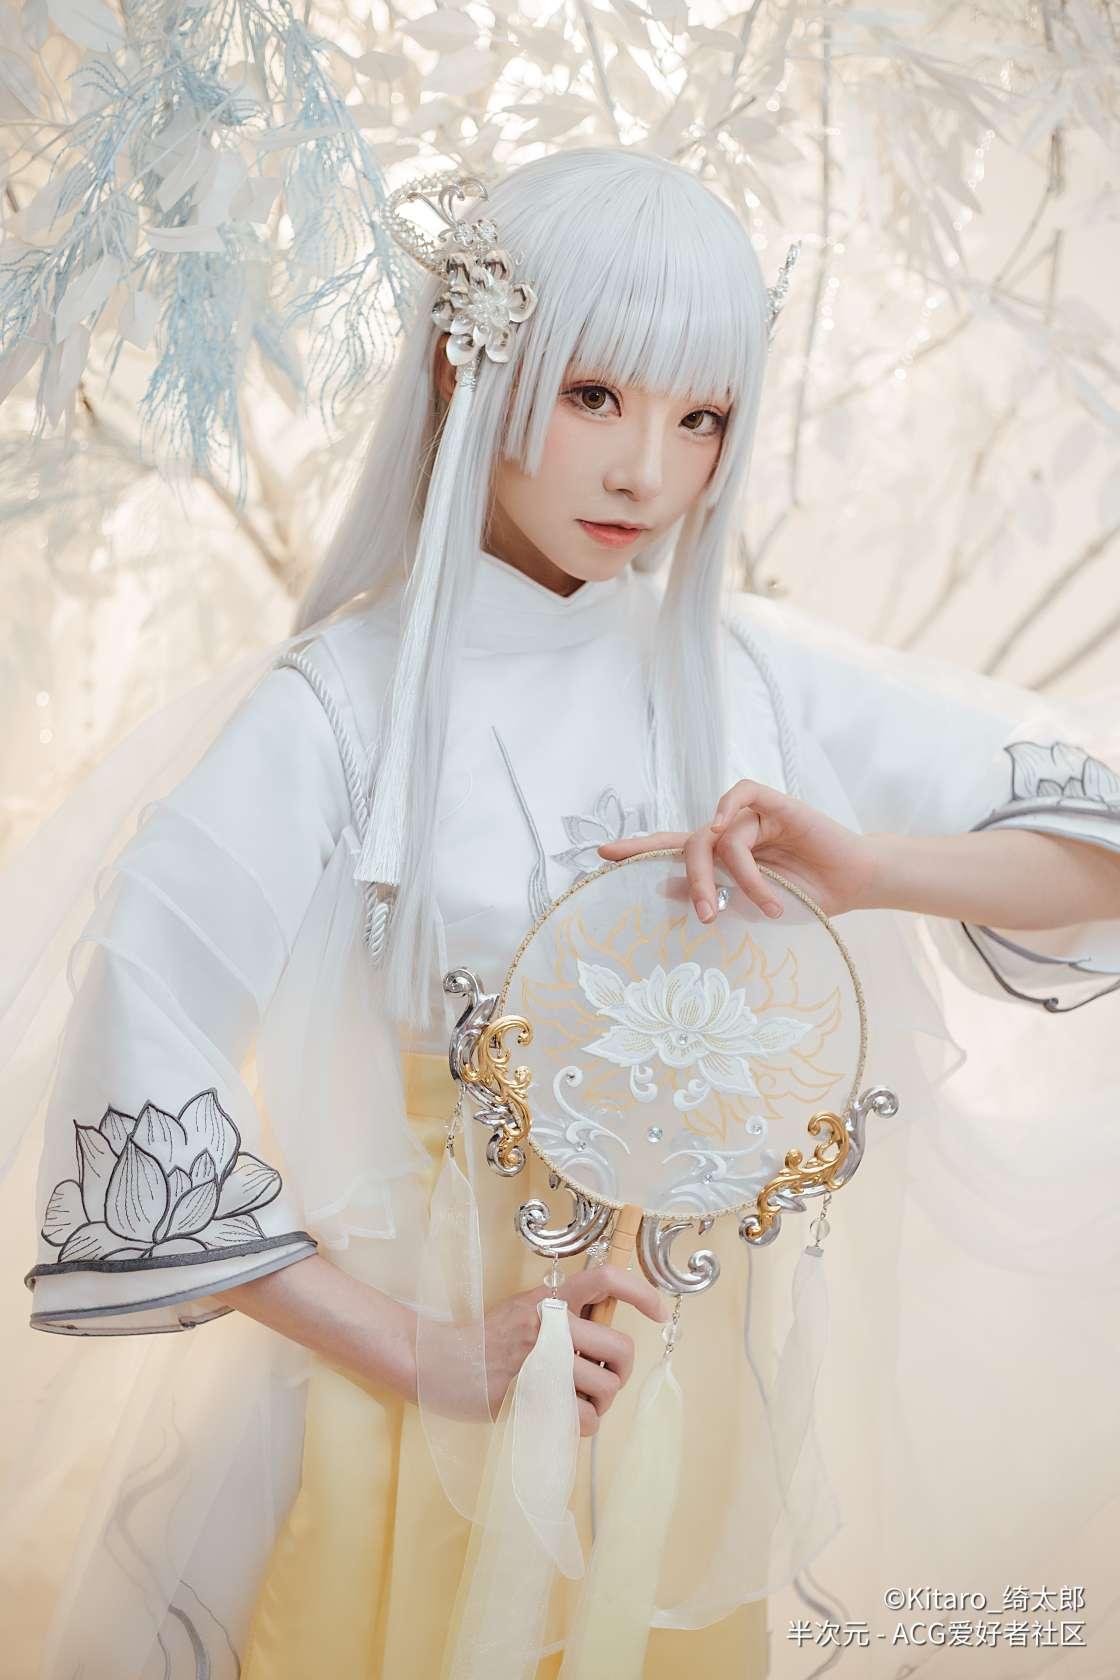 【cos】#镇魔曲2.0季##cosplay